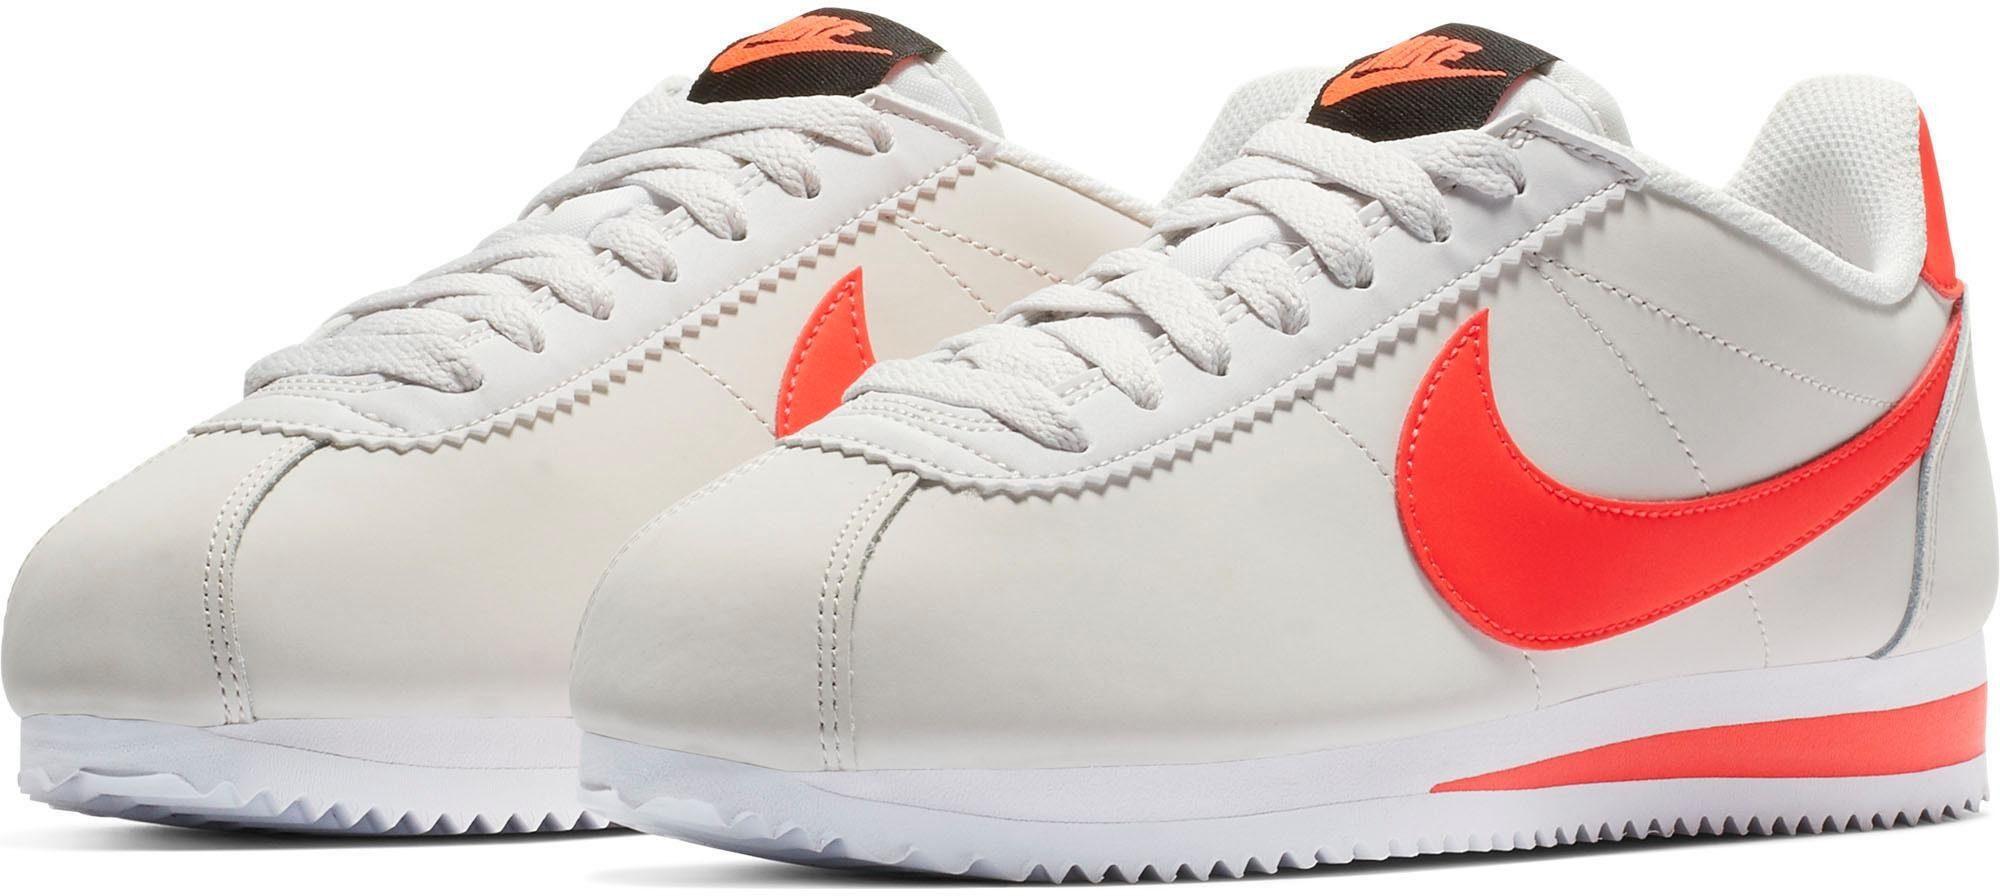 Nike Sportswear »Wmns Classic Cortez Leather« Sneaker online kaufen | OTTO